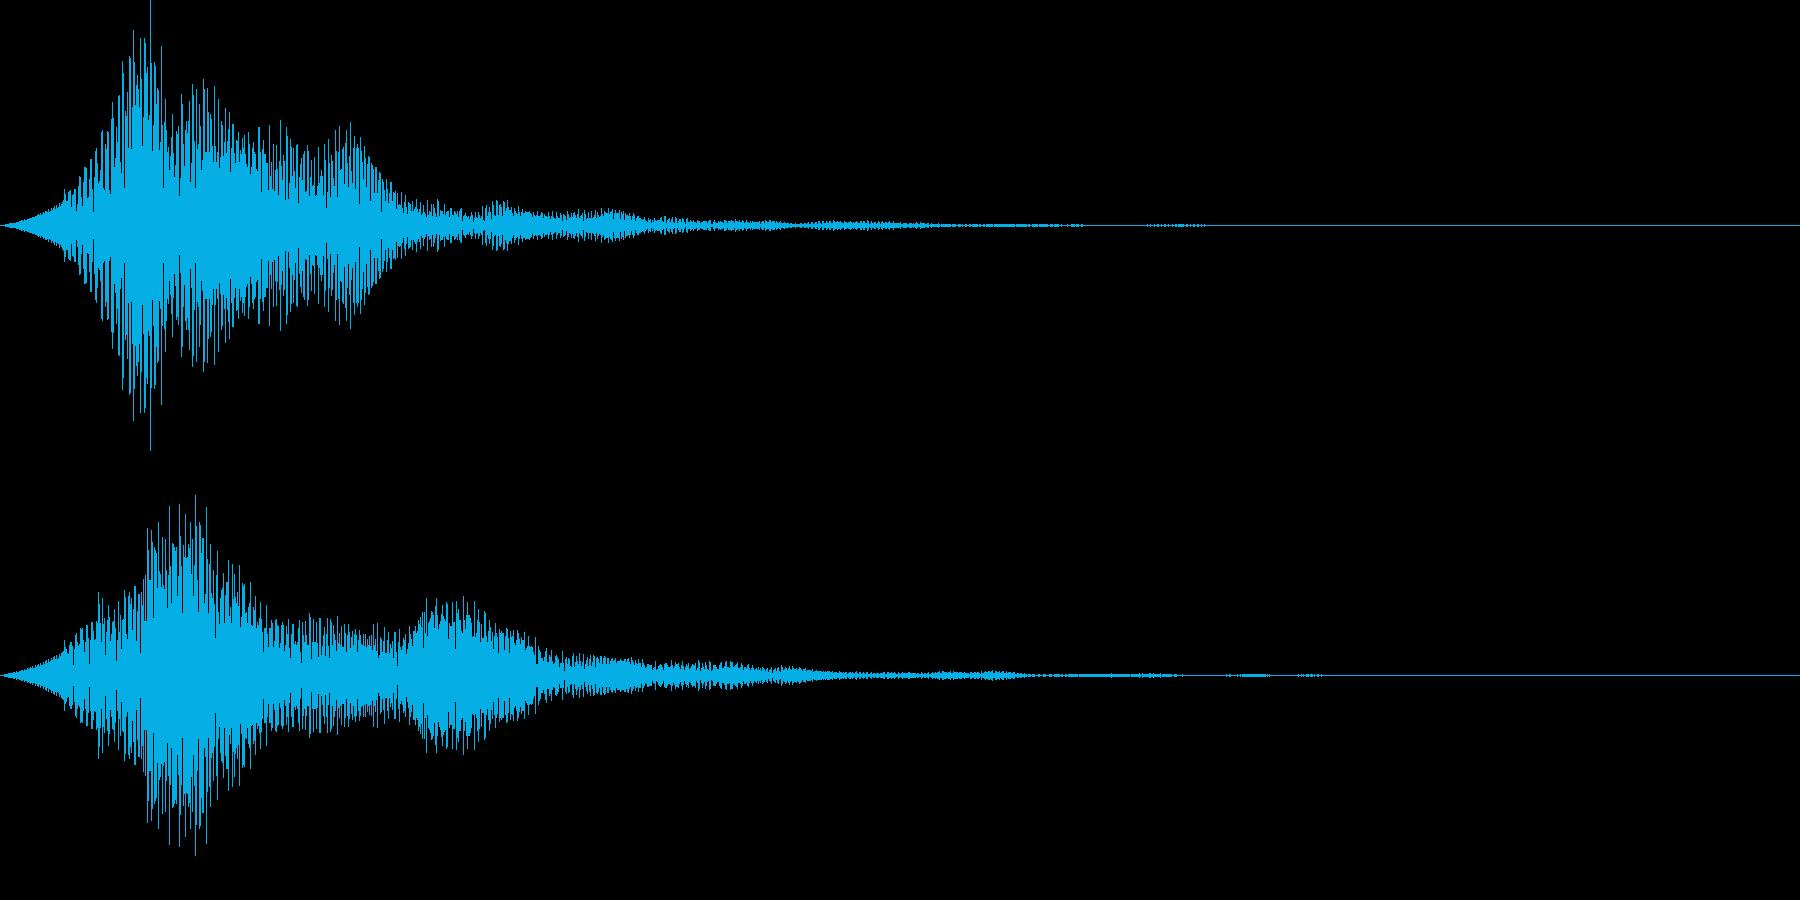 UI ピロリン やわらかい決定音の再生済みの波形